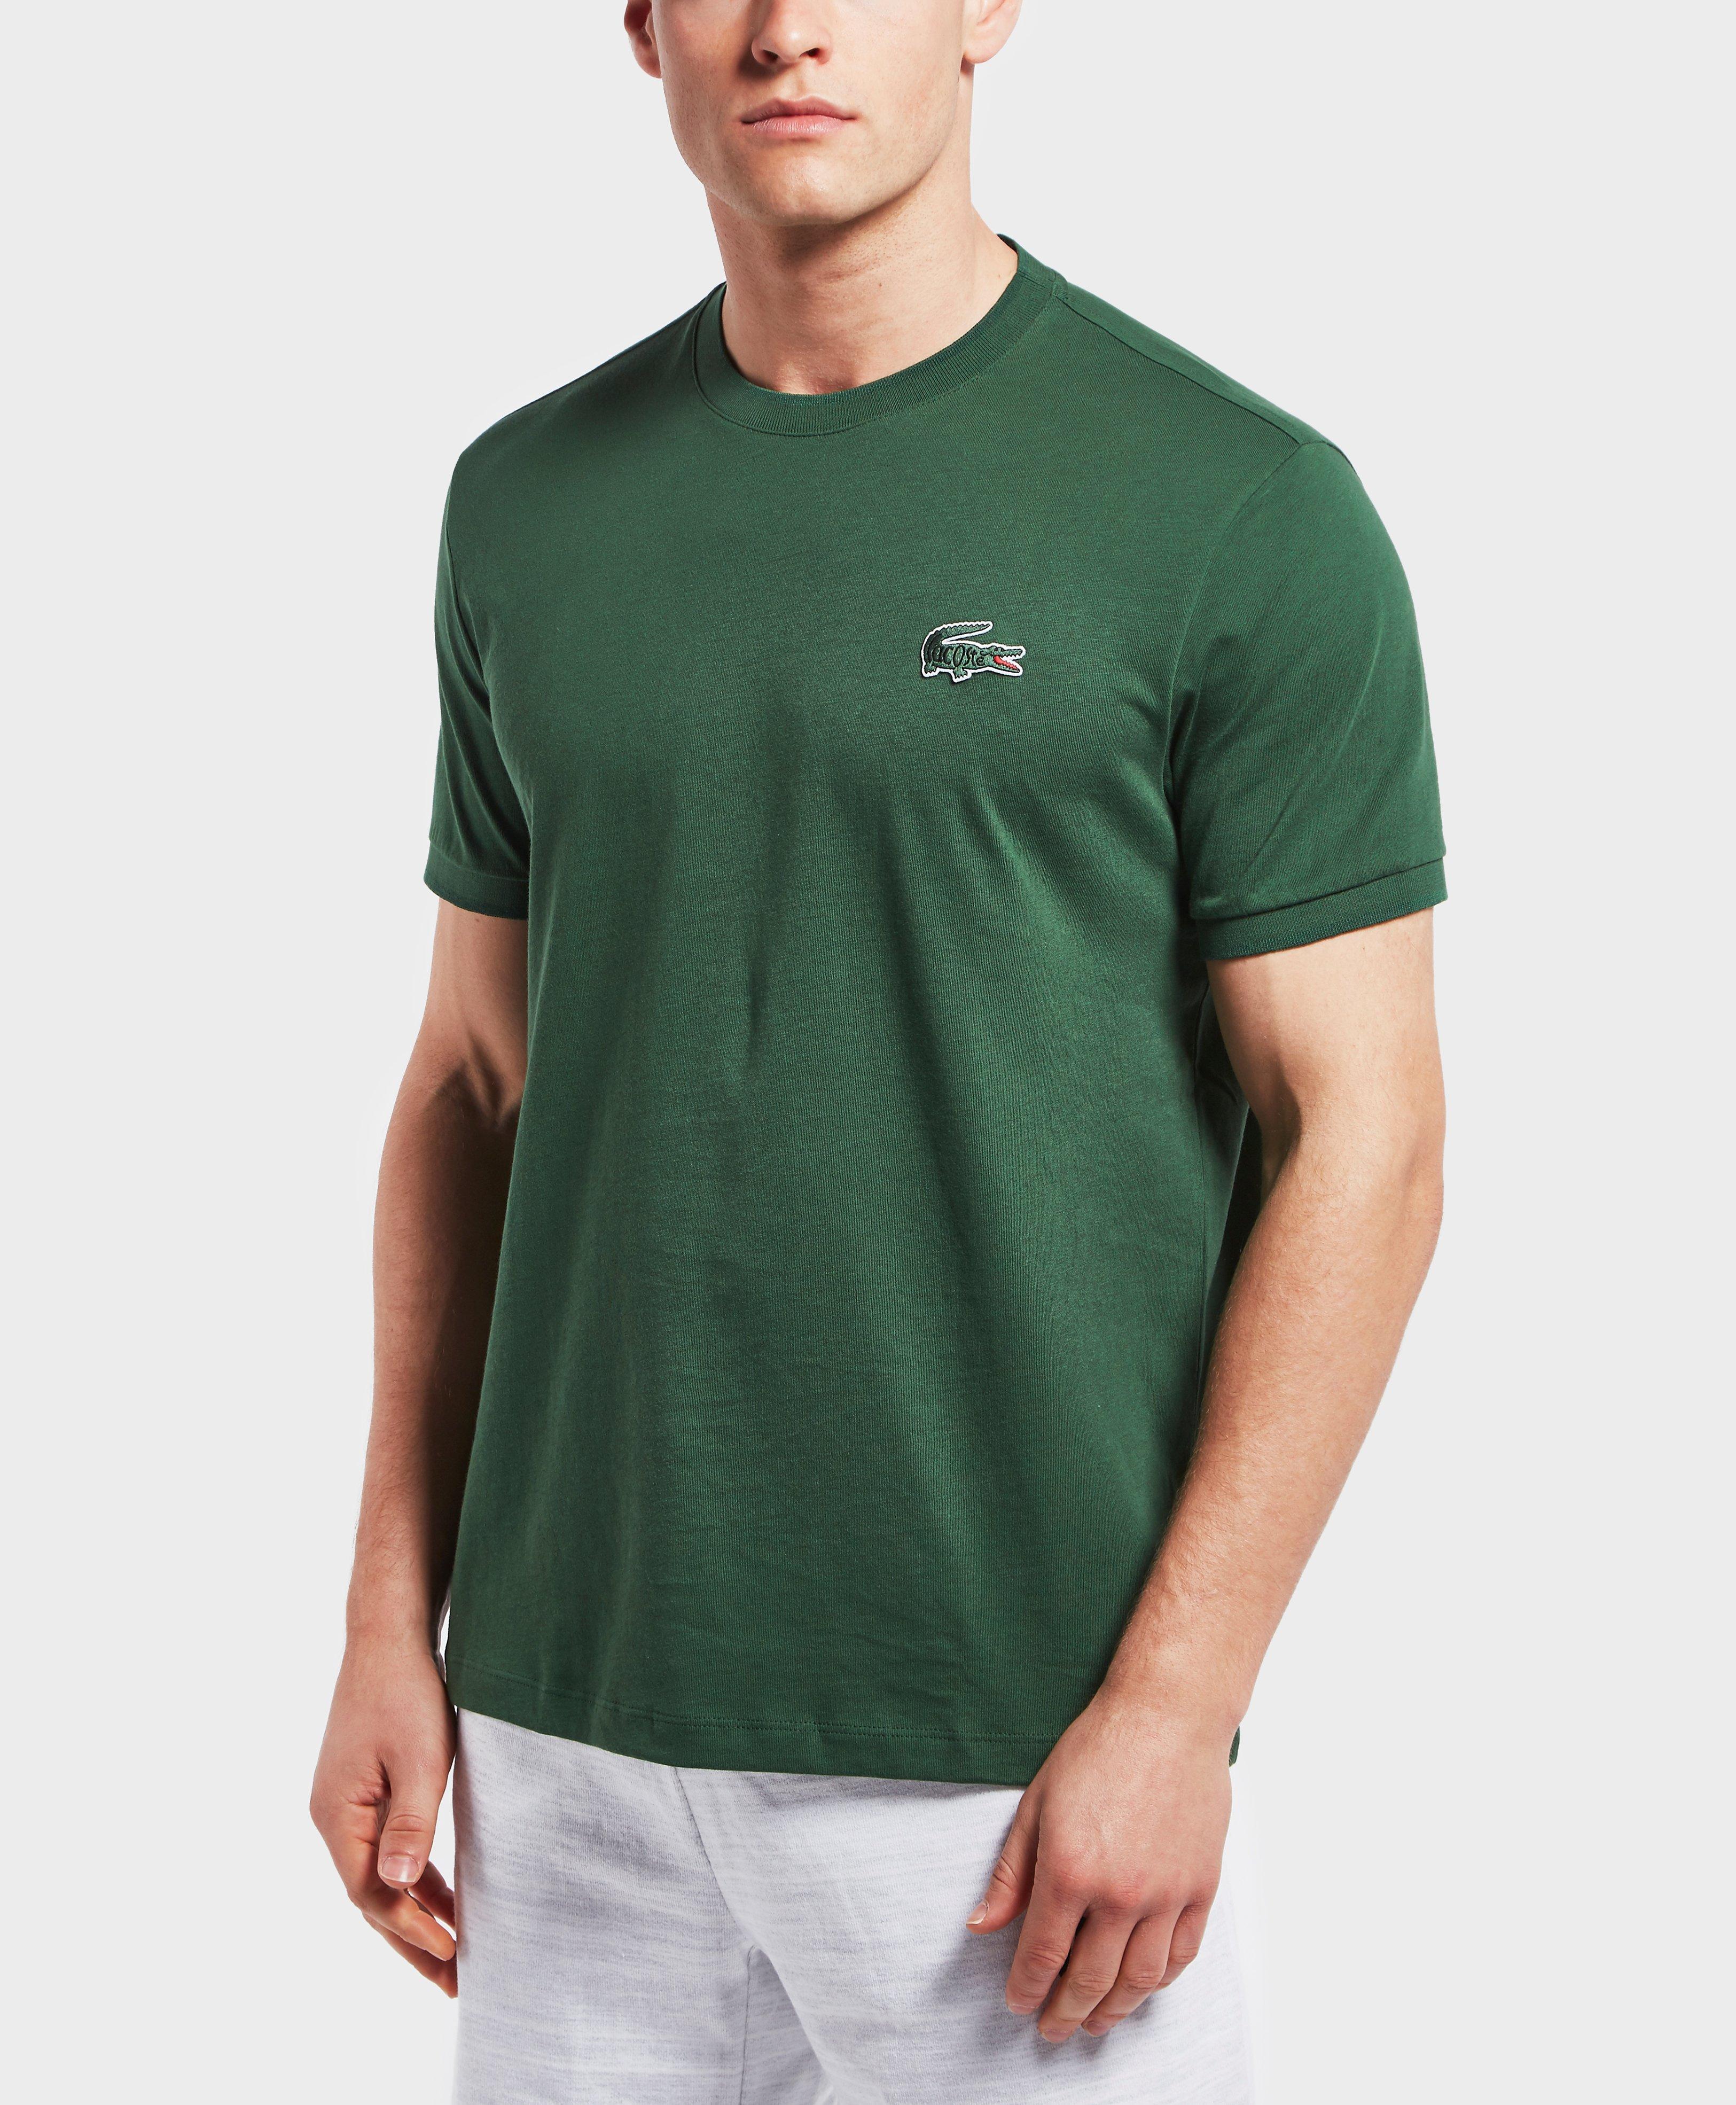 b90c45b01 Lacoste T Shirts Online Australia - BCD Tofu House